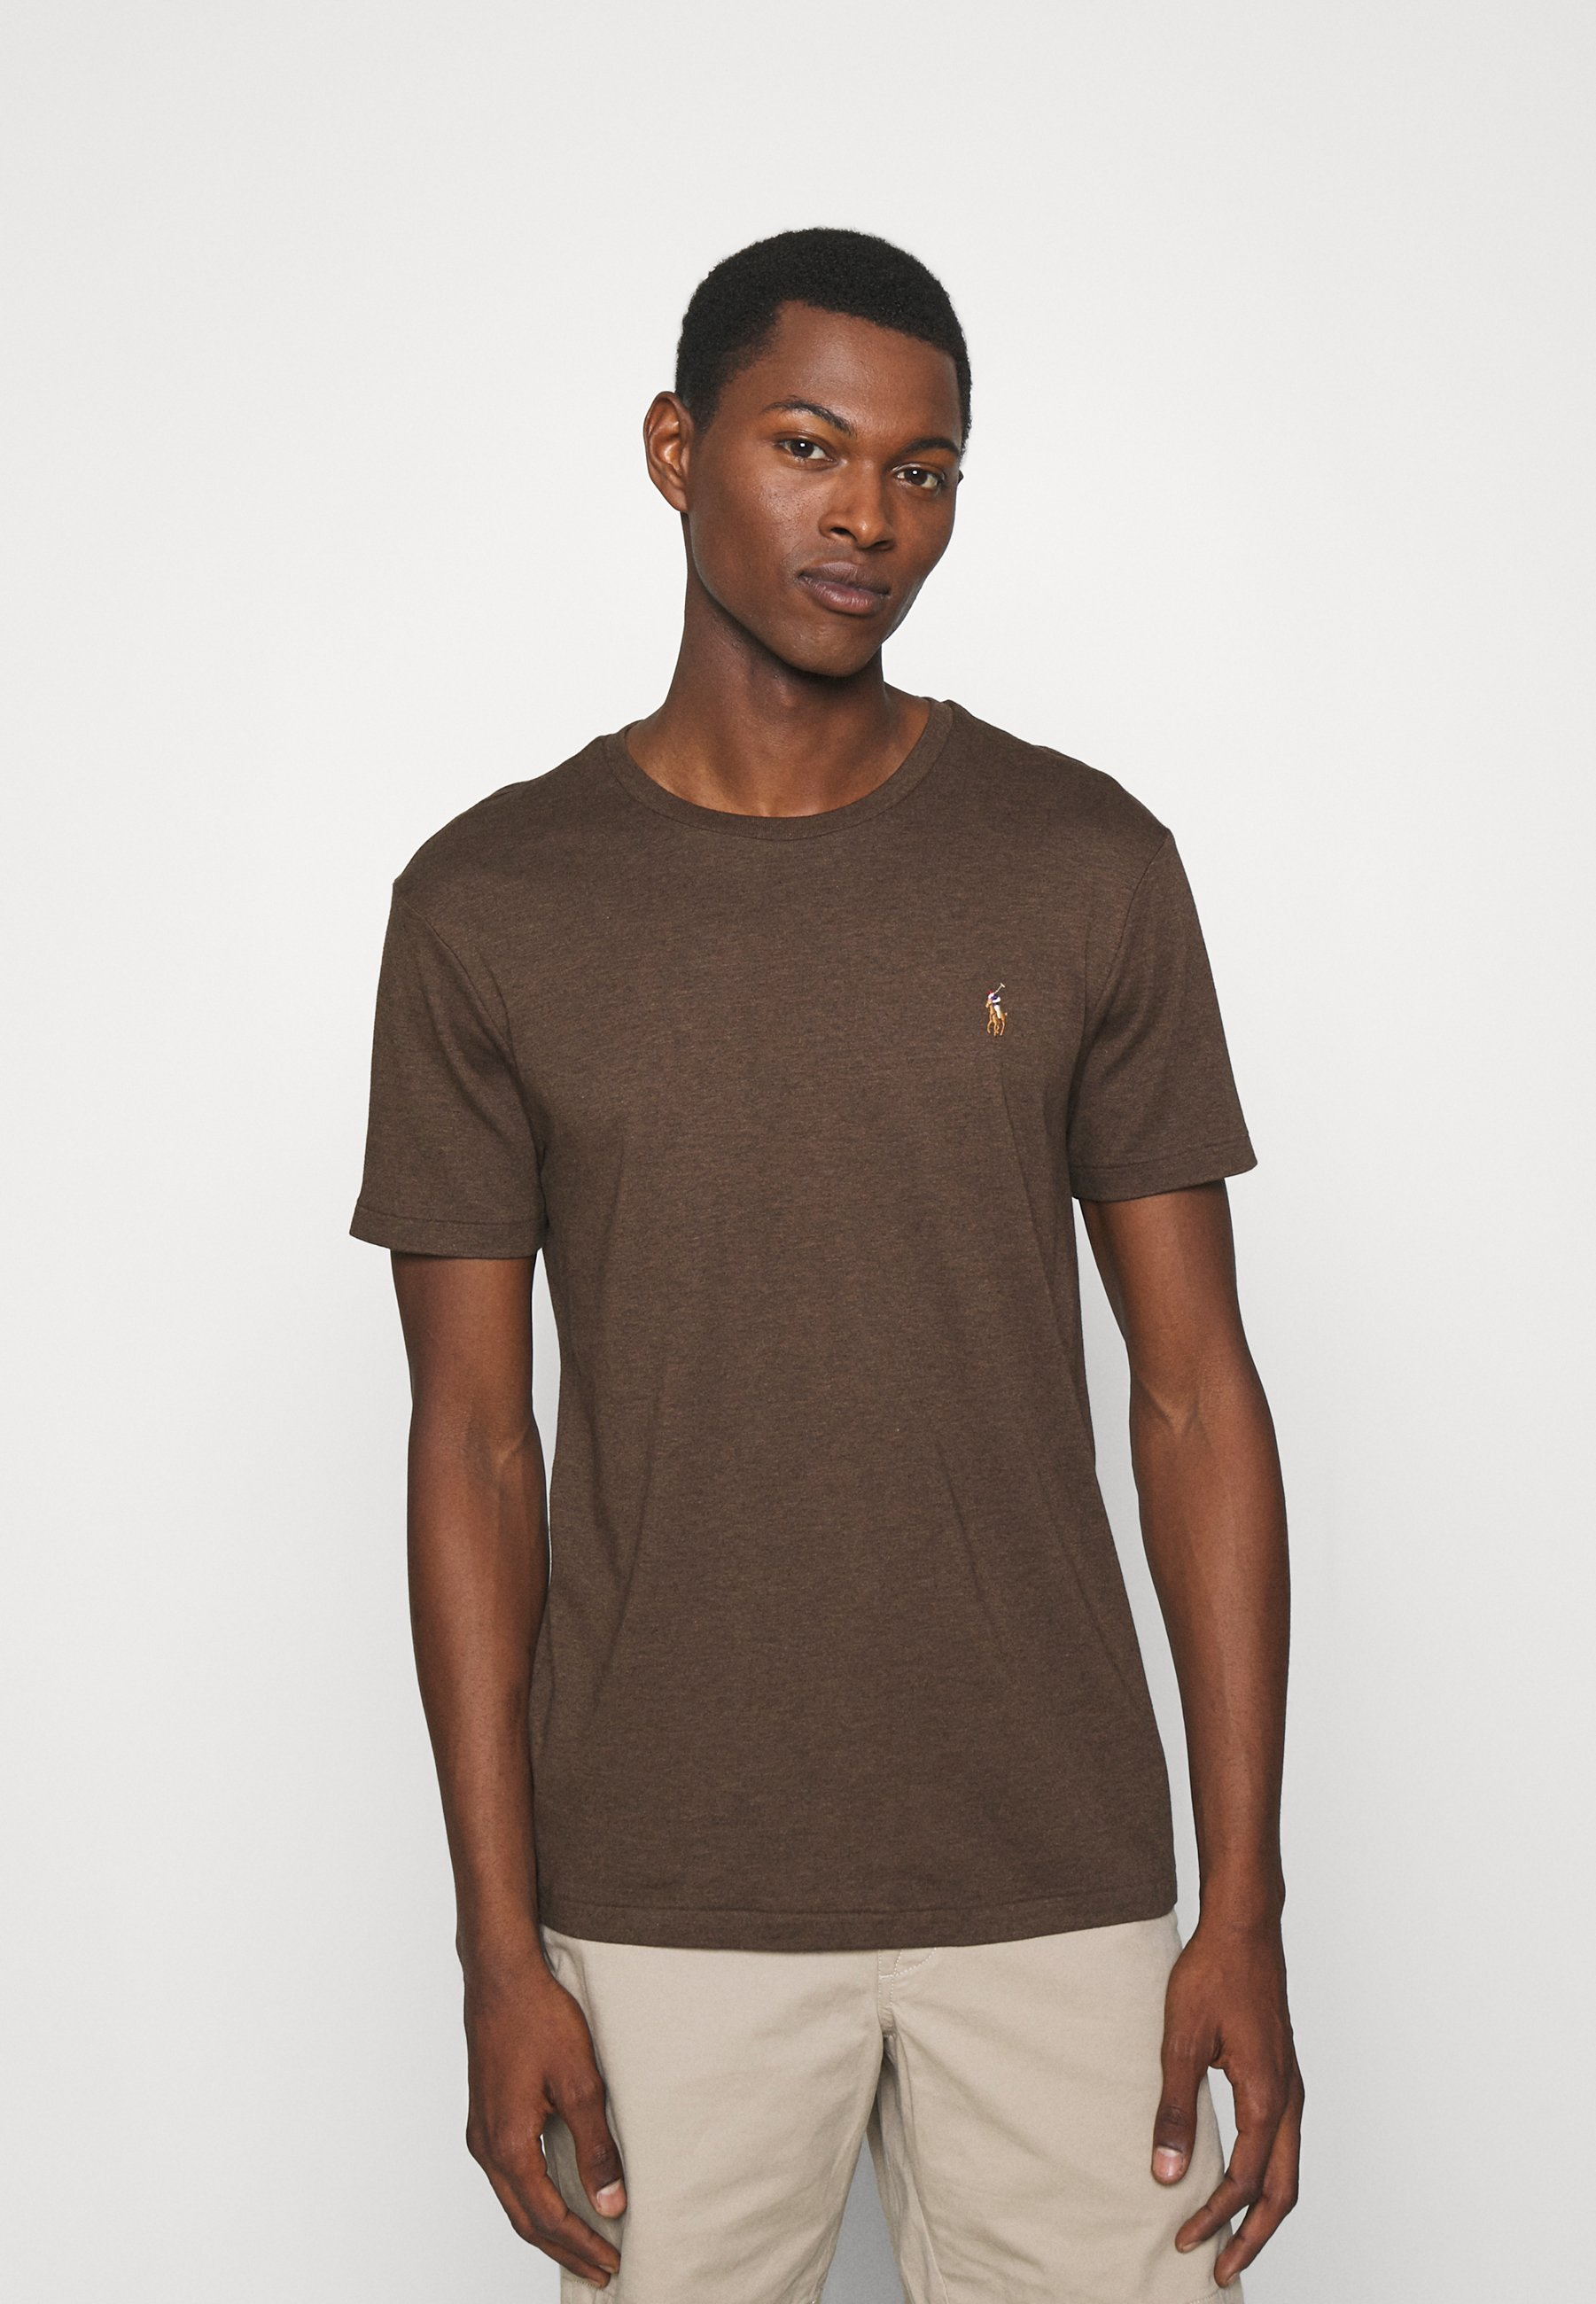 Homme CUSTOM SLIM SOFT COTTON TEE - T-shirt basique